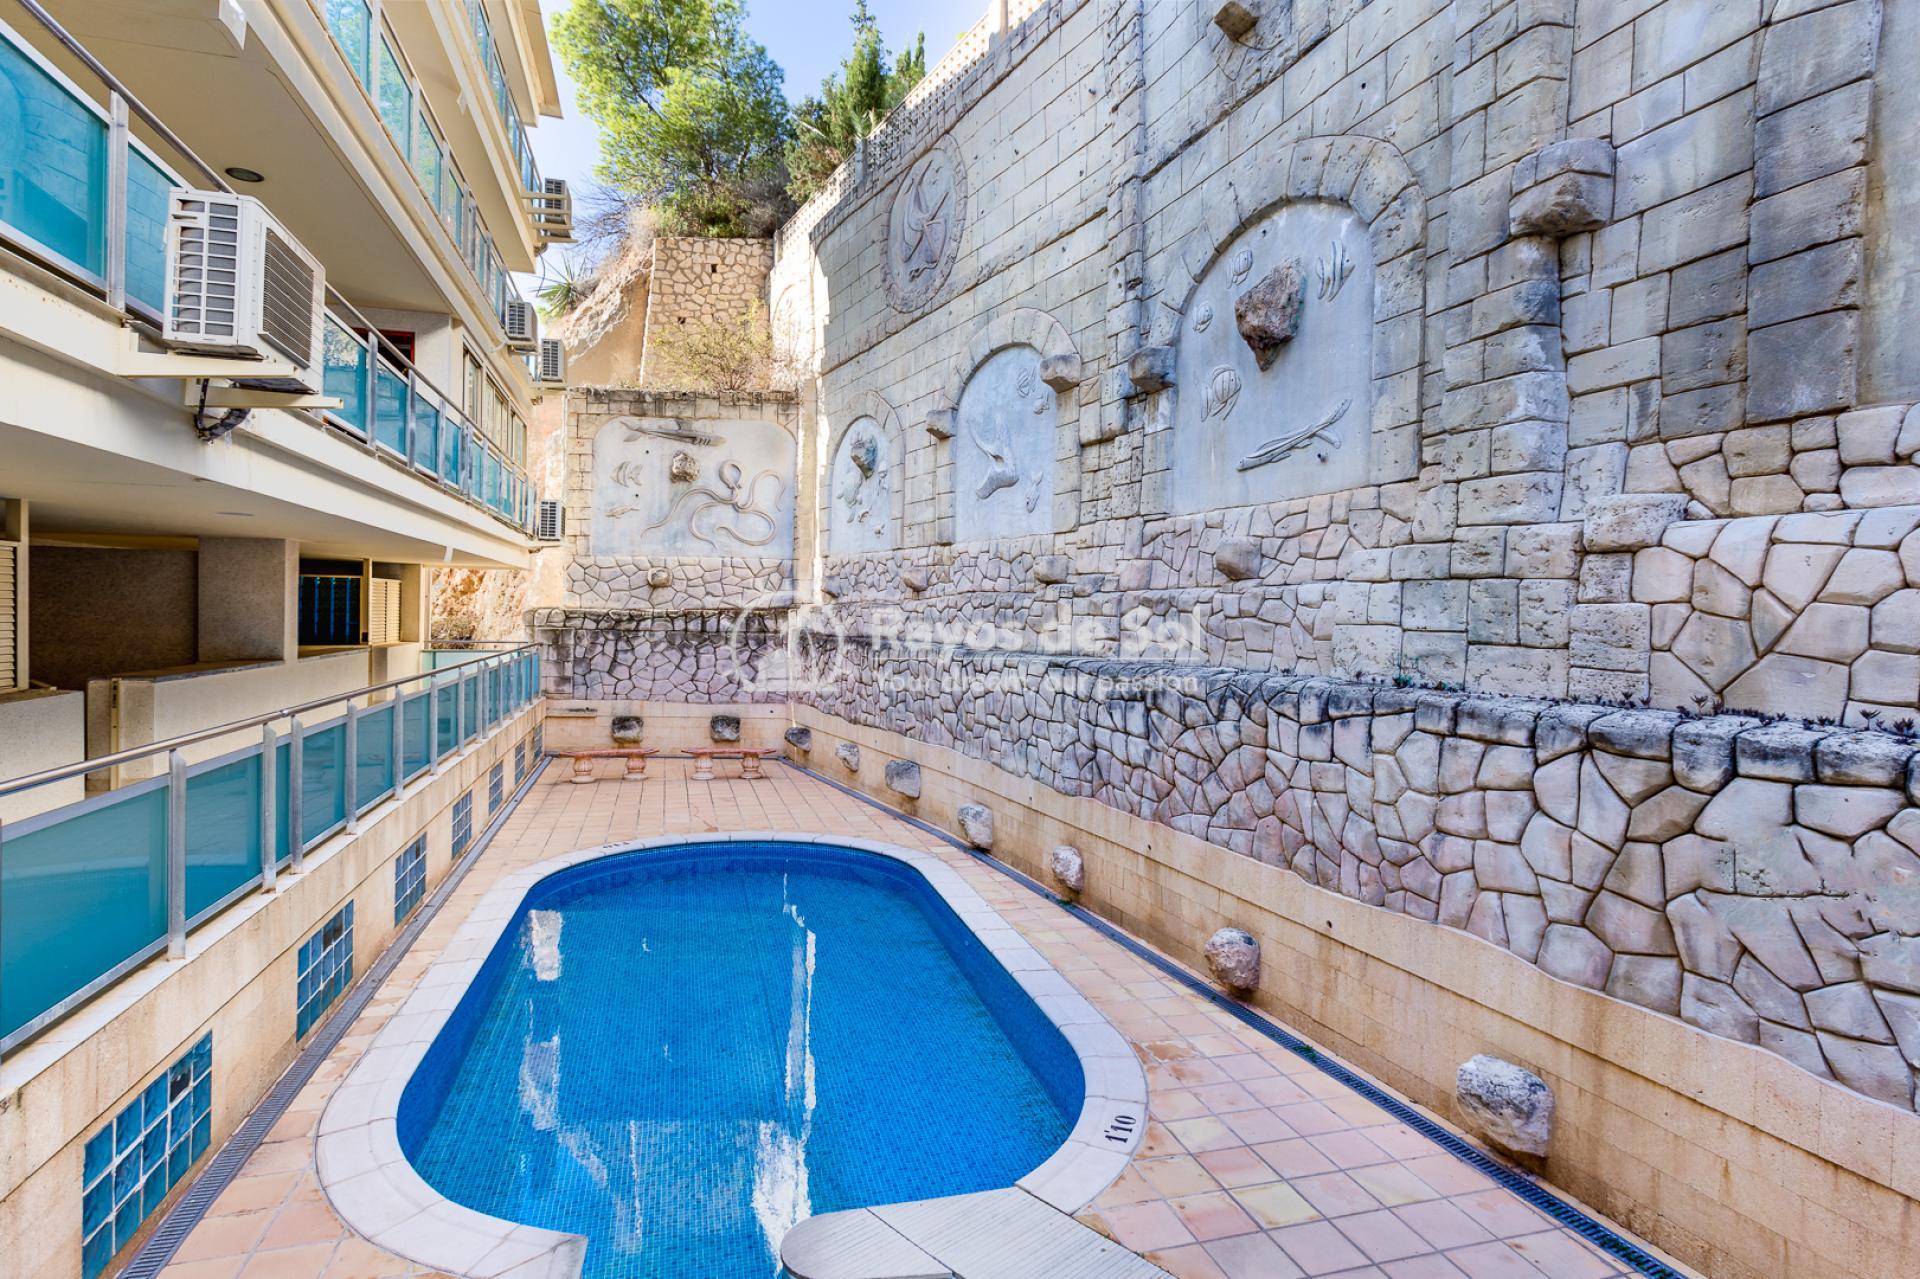 Turnekey first line apartments  in Altea, Costa Blanca (Alteabeach) - 43